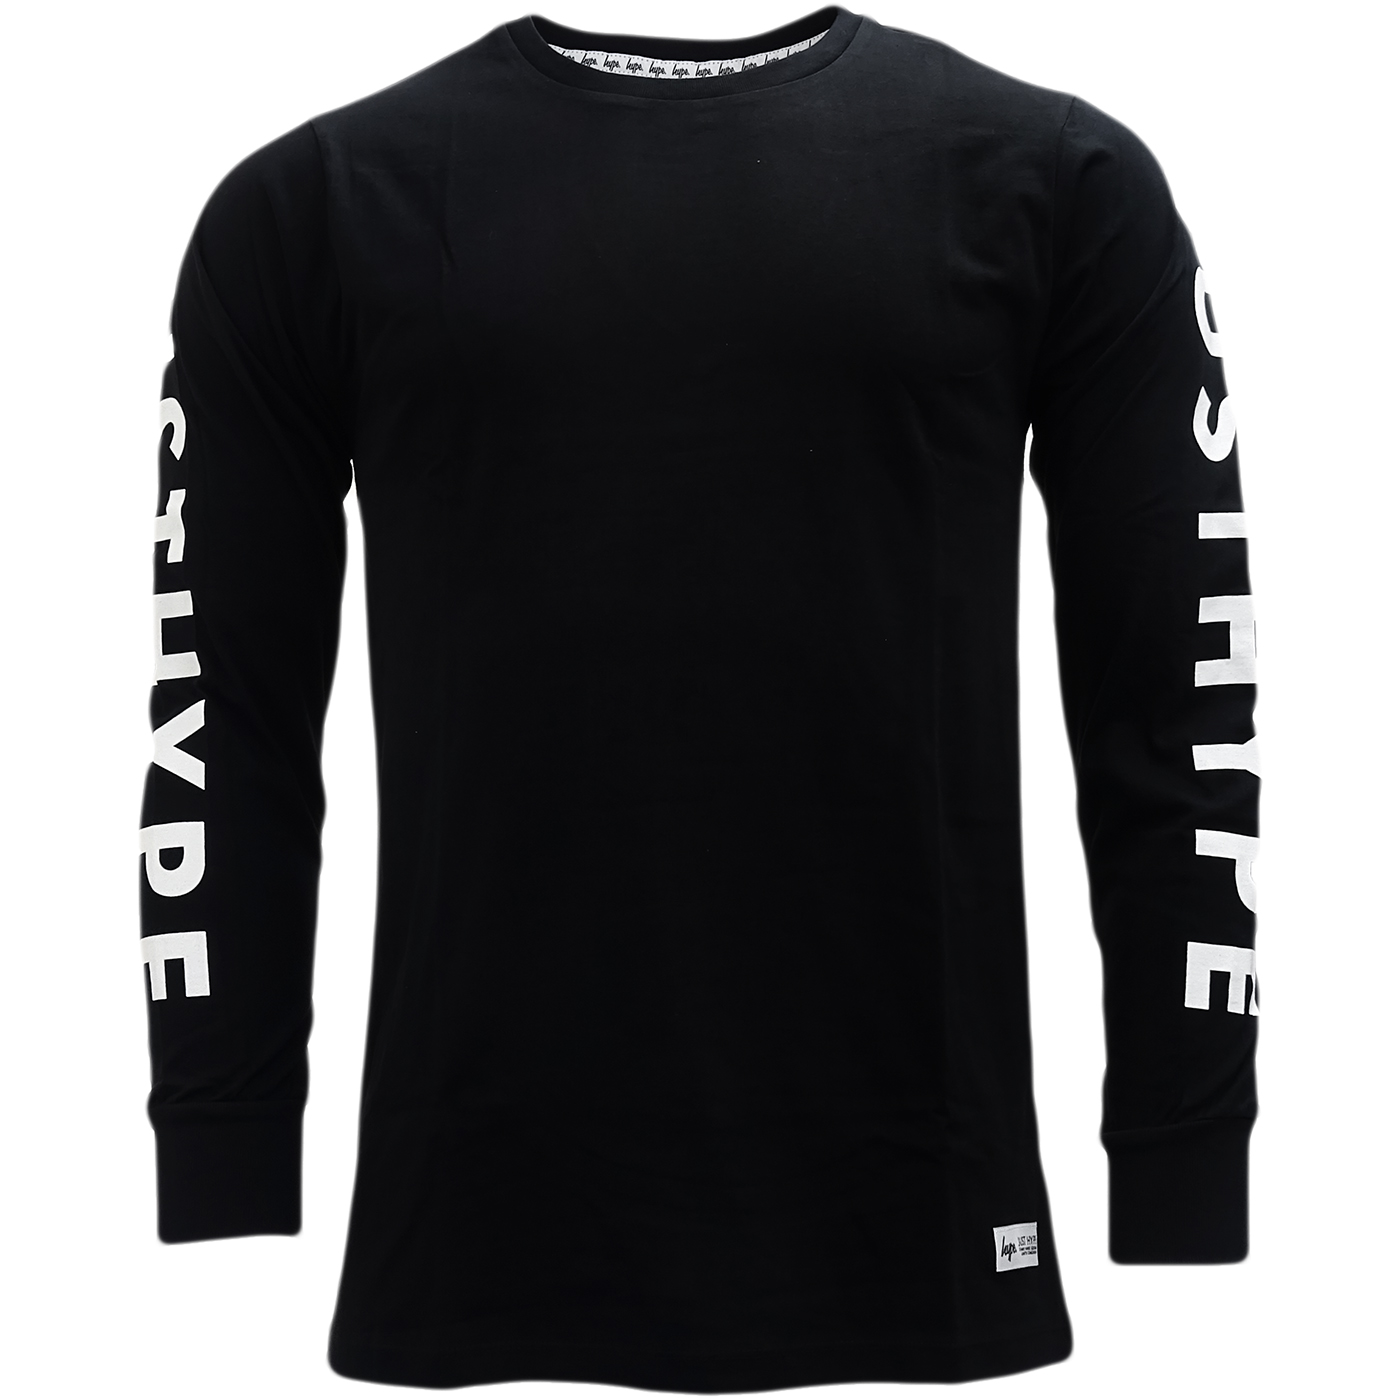 Long Shirt Design In Black Colour